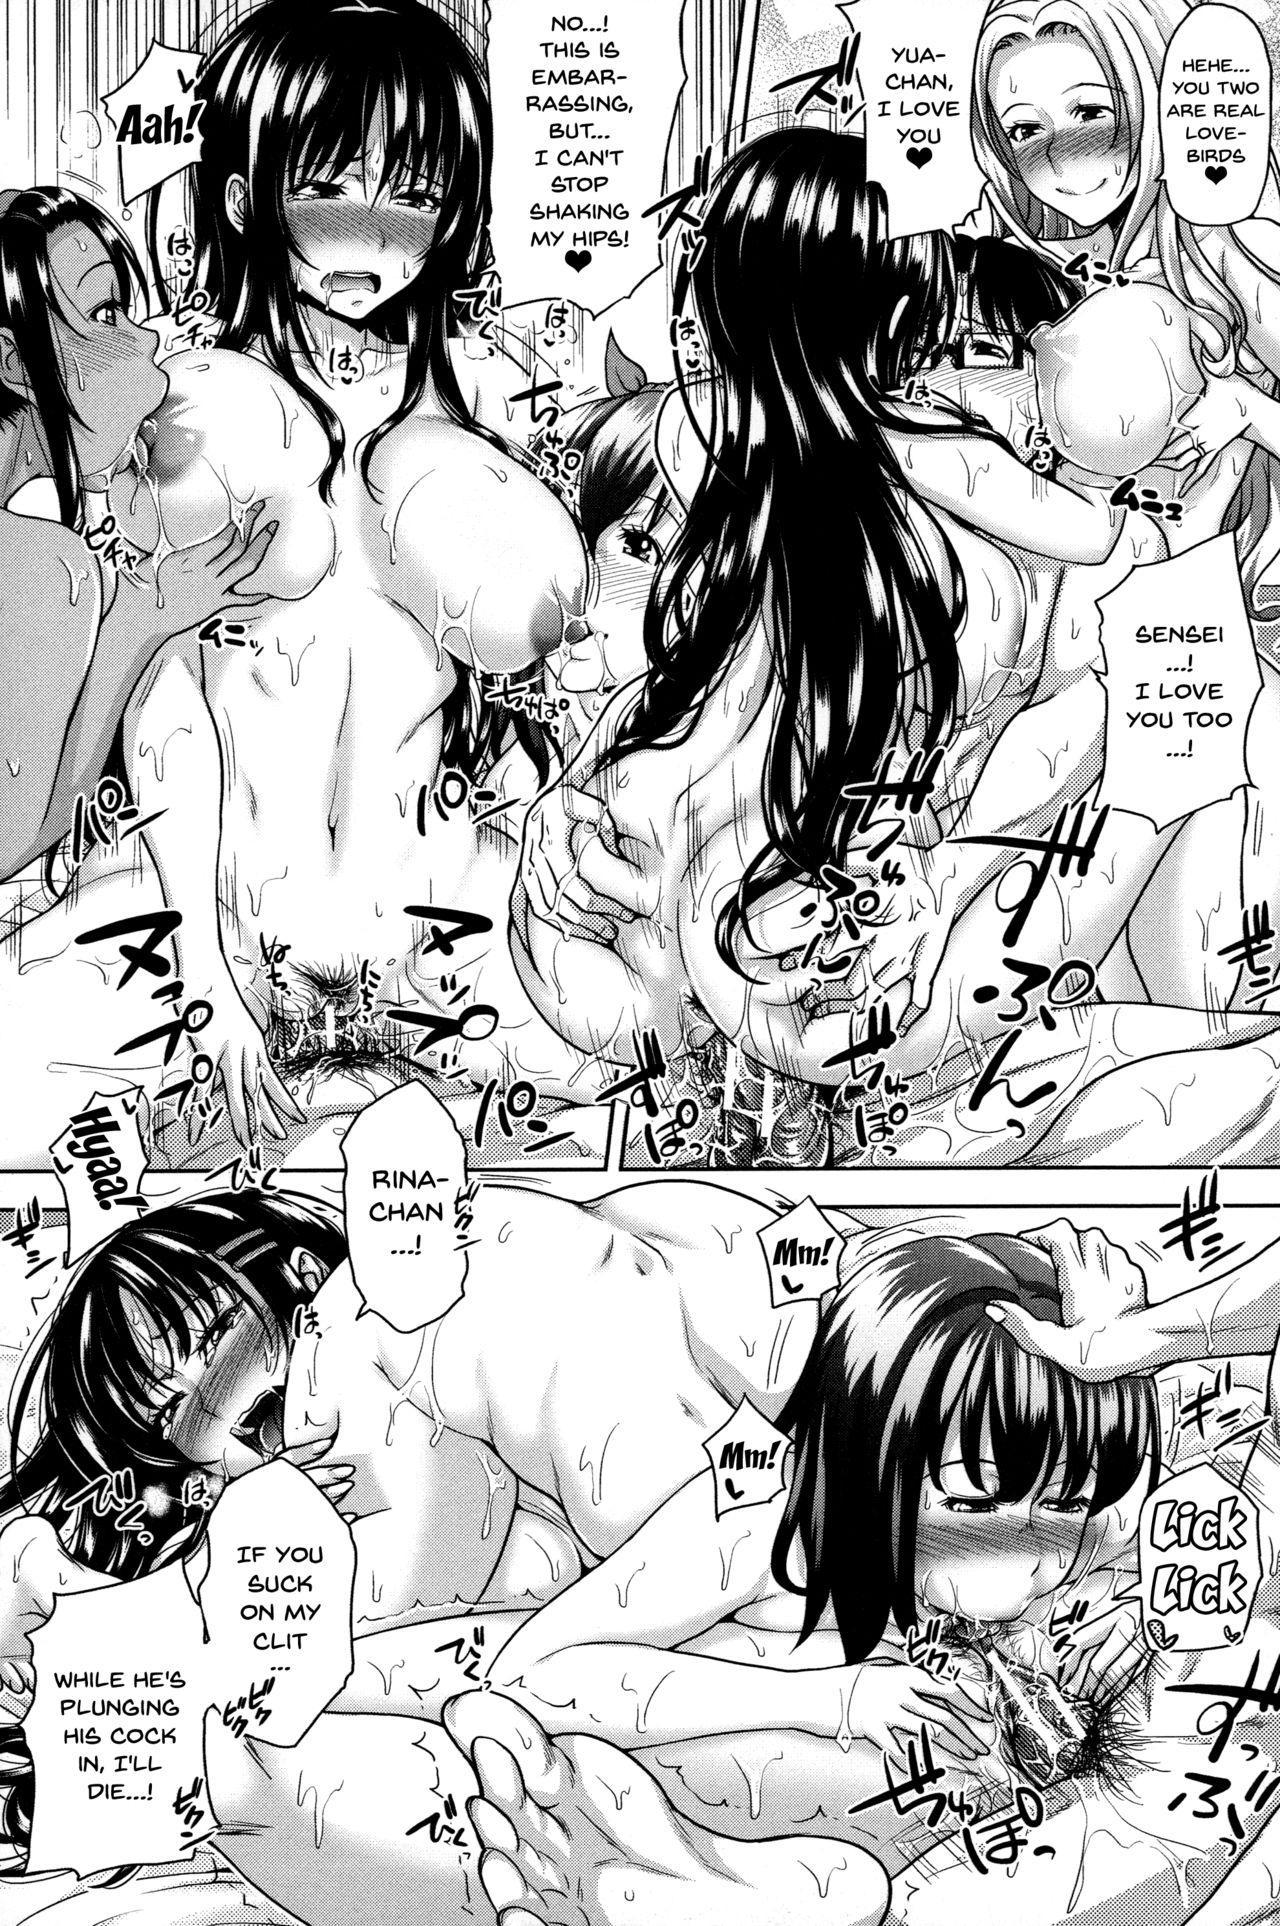 Pakotate! Seikouritsu 0% no Teppeki Bishojo VS Seikouritsu 100% no Hentai Katei Kyoushi   Pakotate! Sex Rate 0% Iron-Willed Beautiful Virgins VS Sex Rate 100% Perverted Coach 192